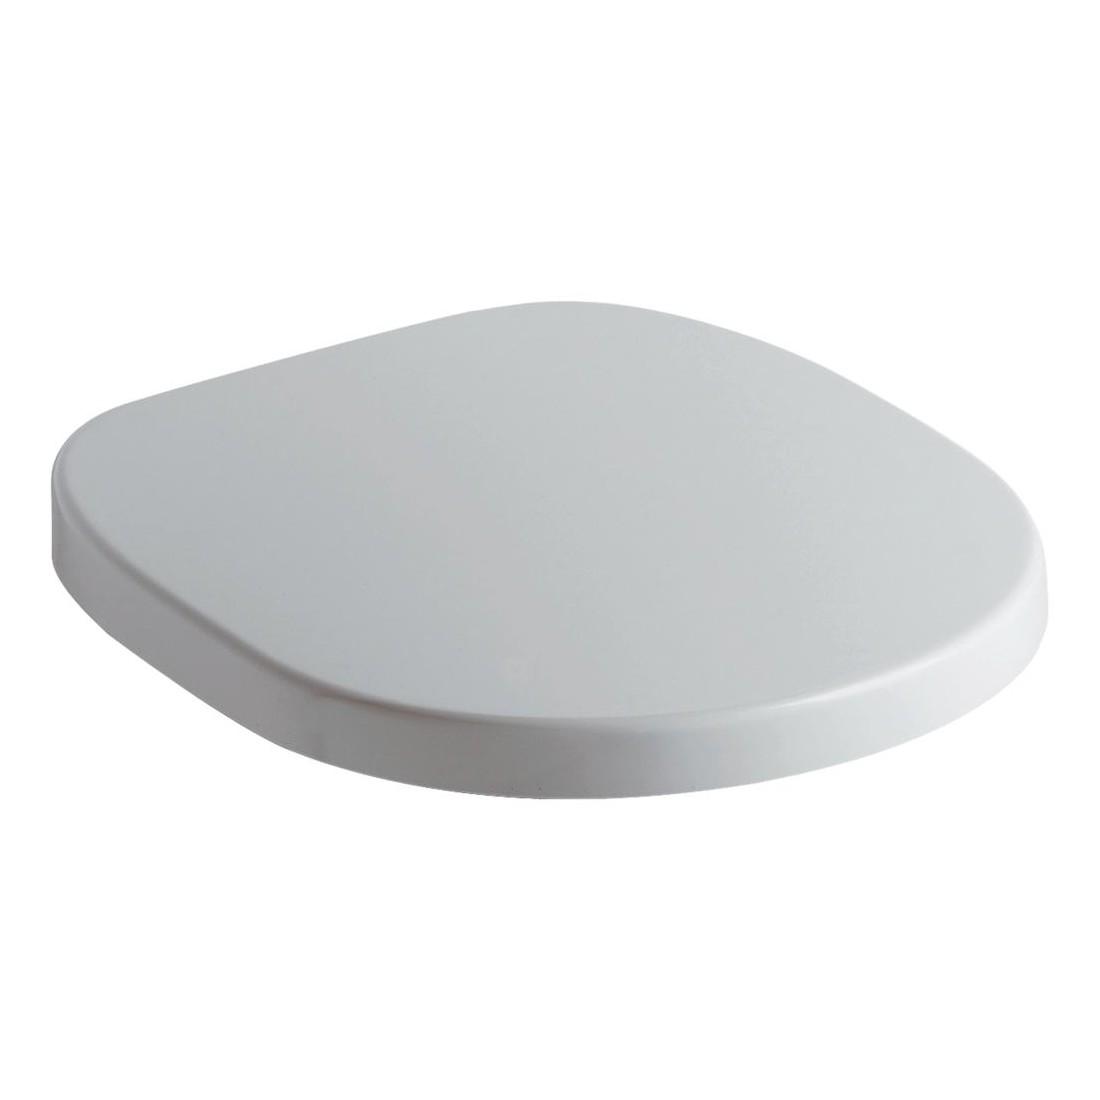 Dangtis WC Ideal Standard Connect, kietas